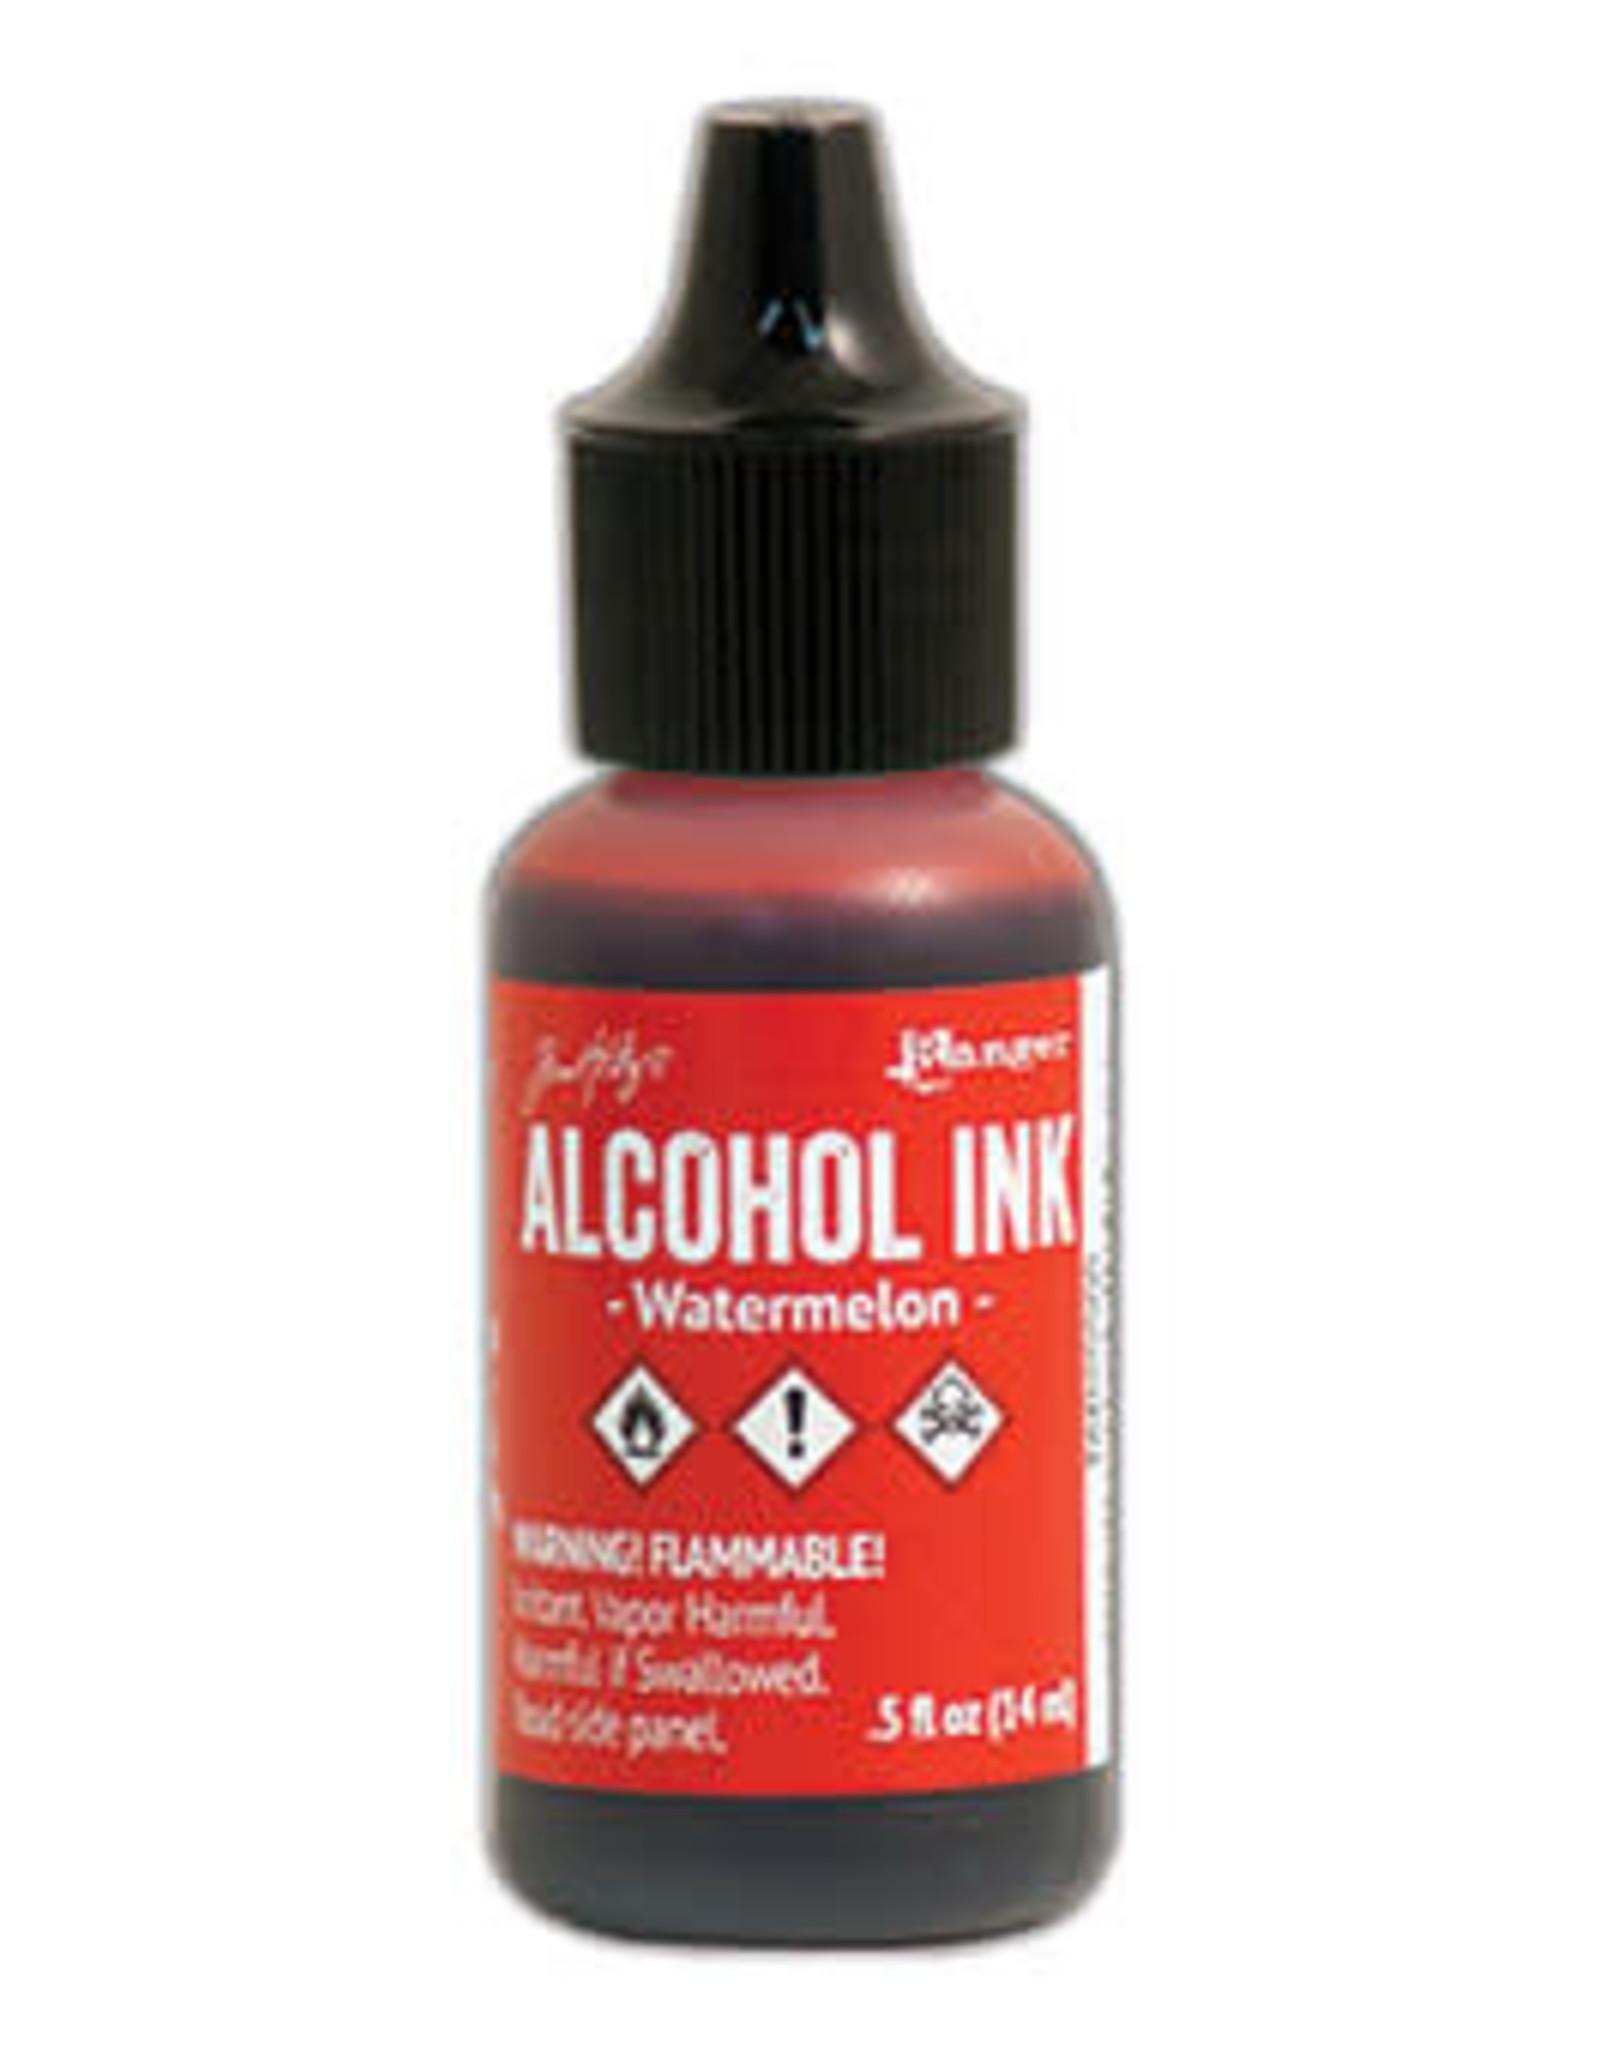 Tim Holtz Alcohol Ink 1/2 oz Watermelon